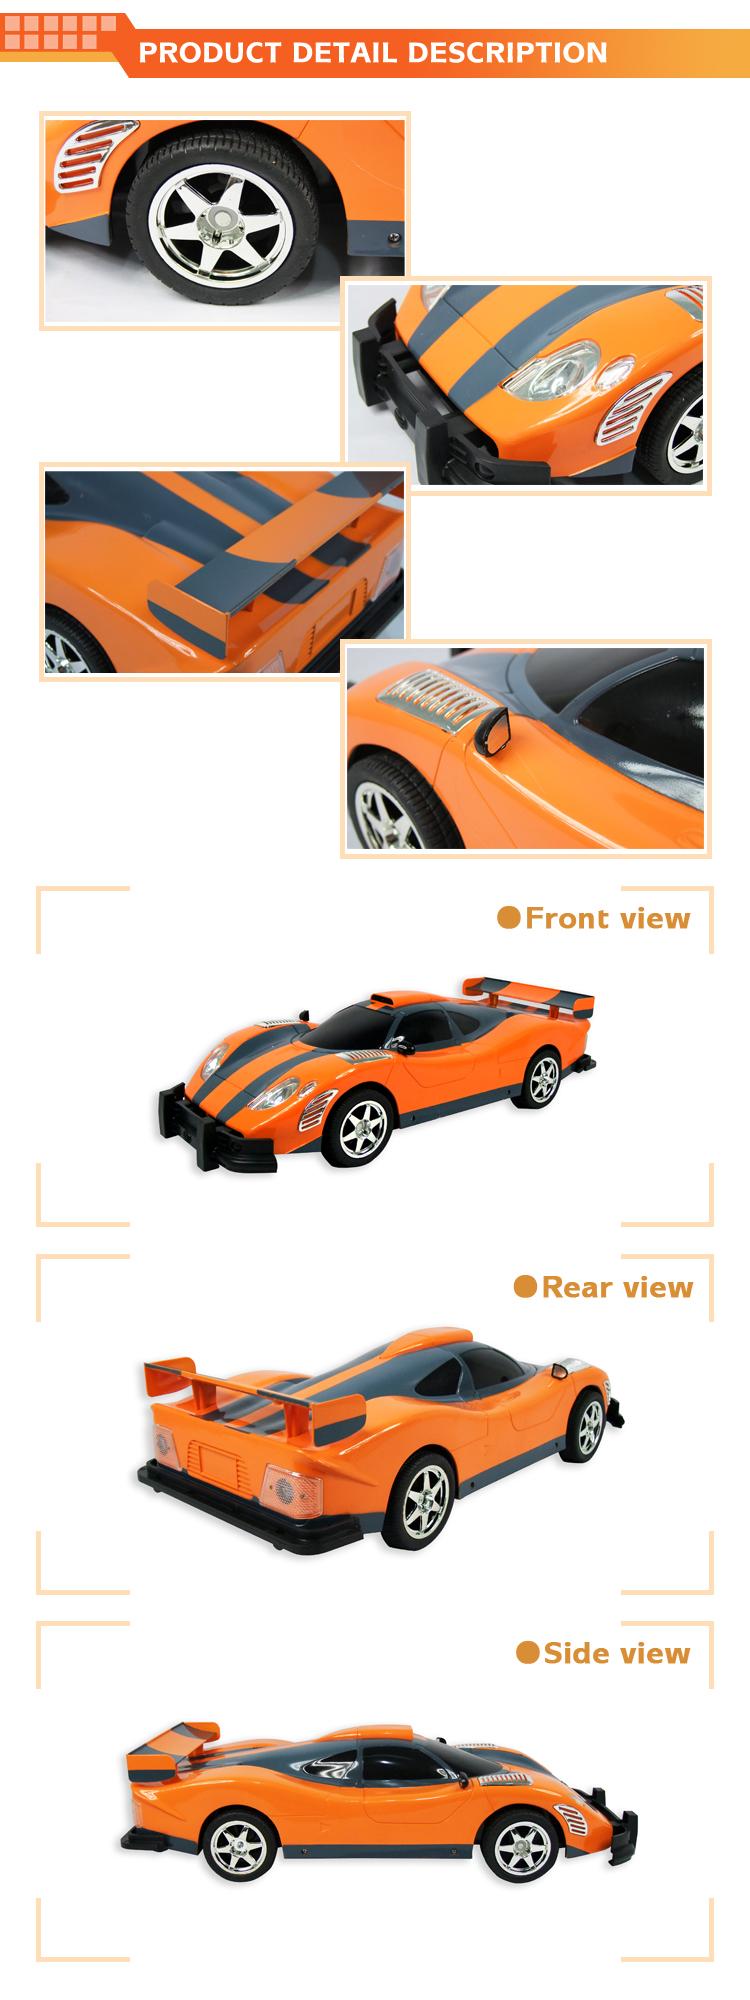 wholesale 1 10 orange and red plastic model car kits for sale buy plastic model car kits for. Black Bedroom Furniture Sets. Home Design Ideas